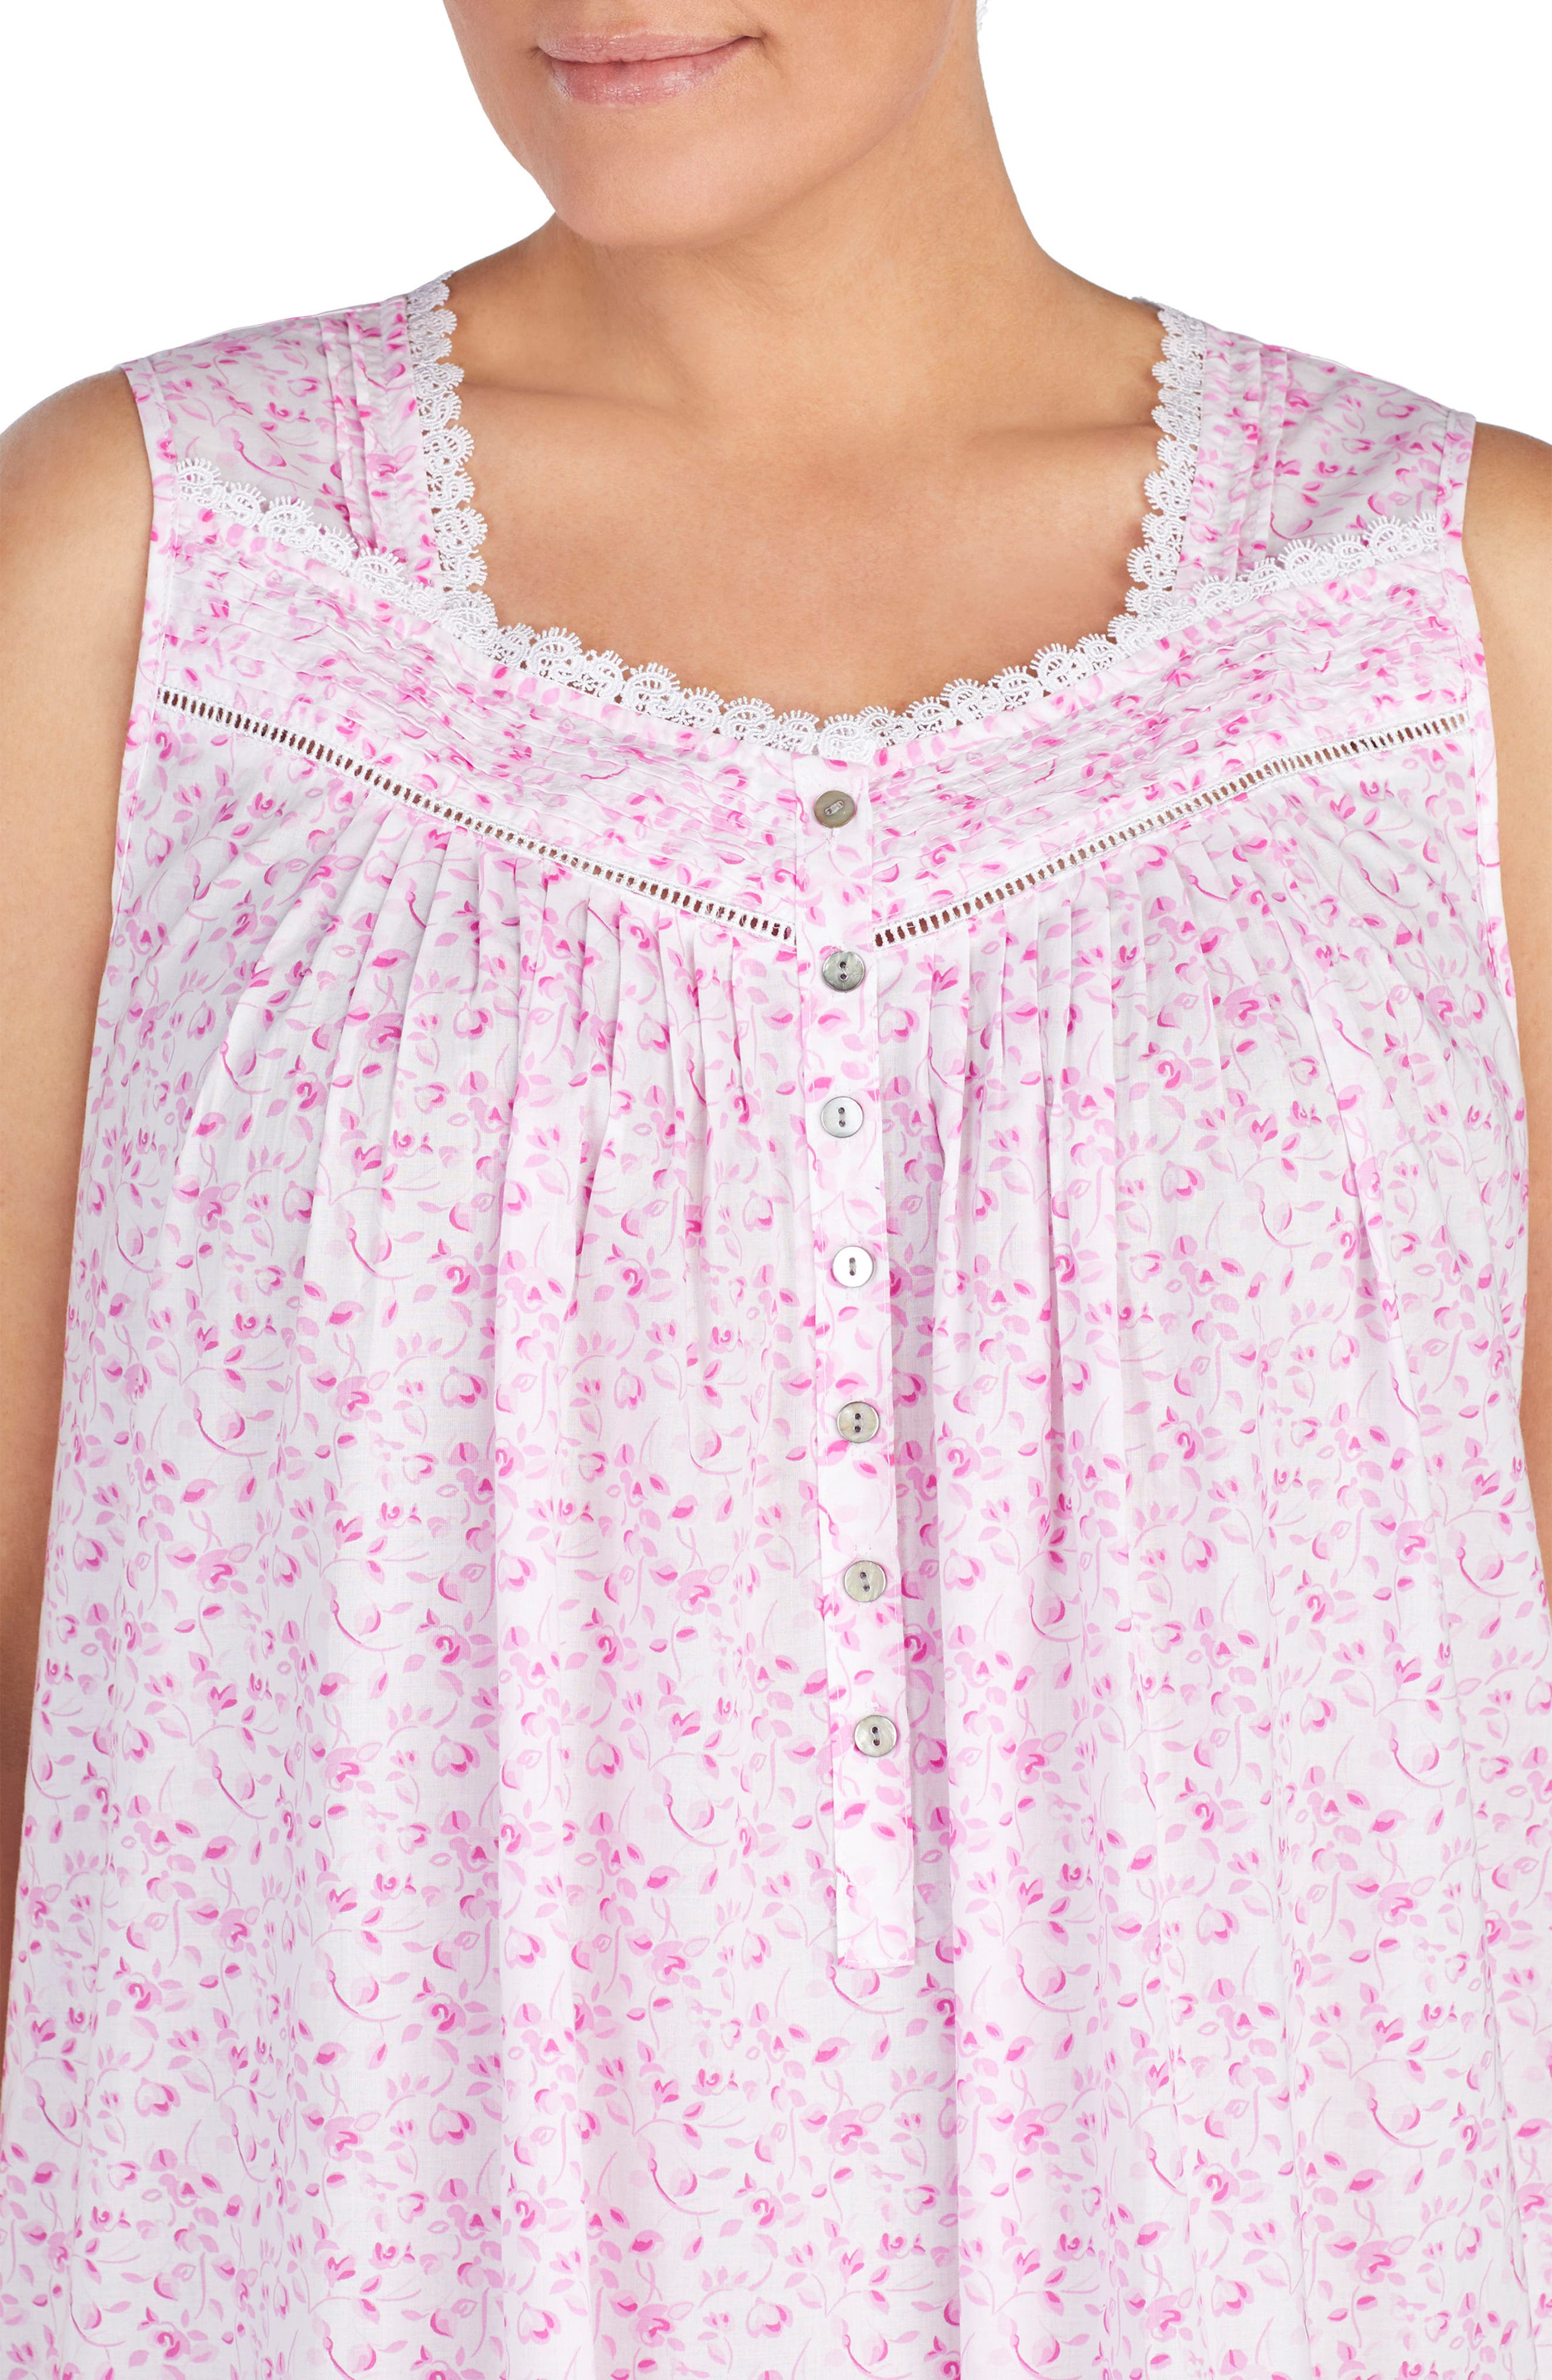 Cotton Lawn Ballet Nightgown,                             Alternate thumbnail 3, color,                             Rose Floral